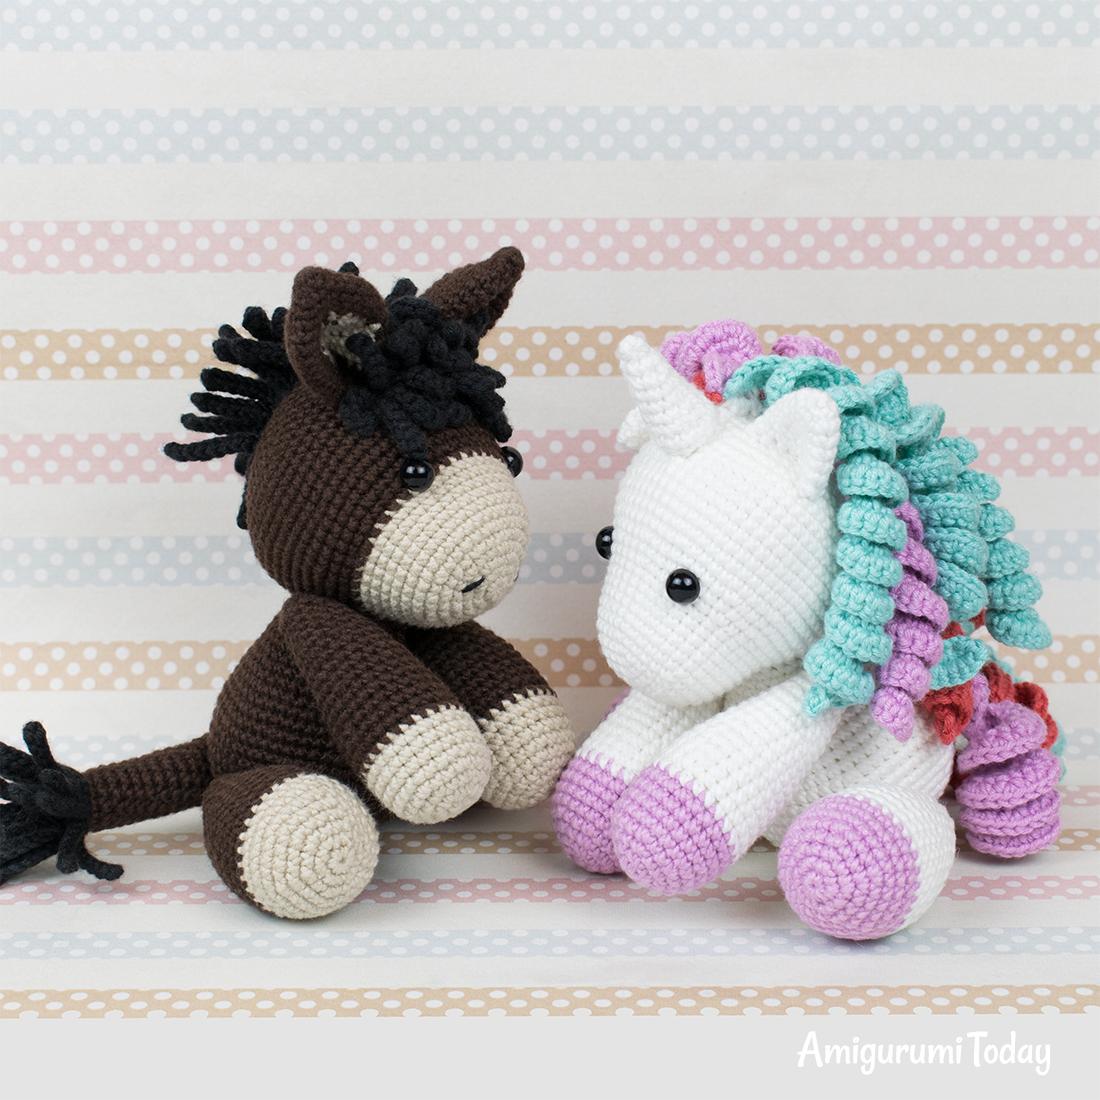 amigurumi Today crochet moments crochet knit creative knitters toy ... | 1100x1100